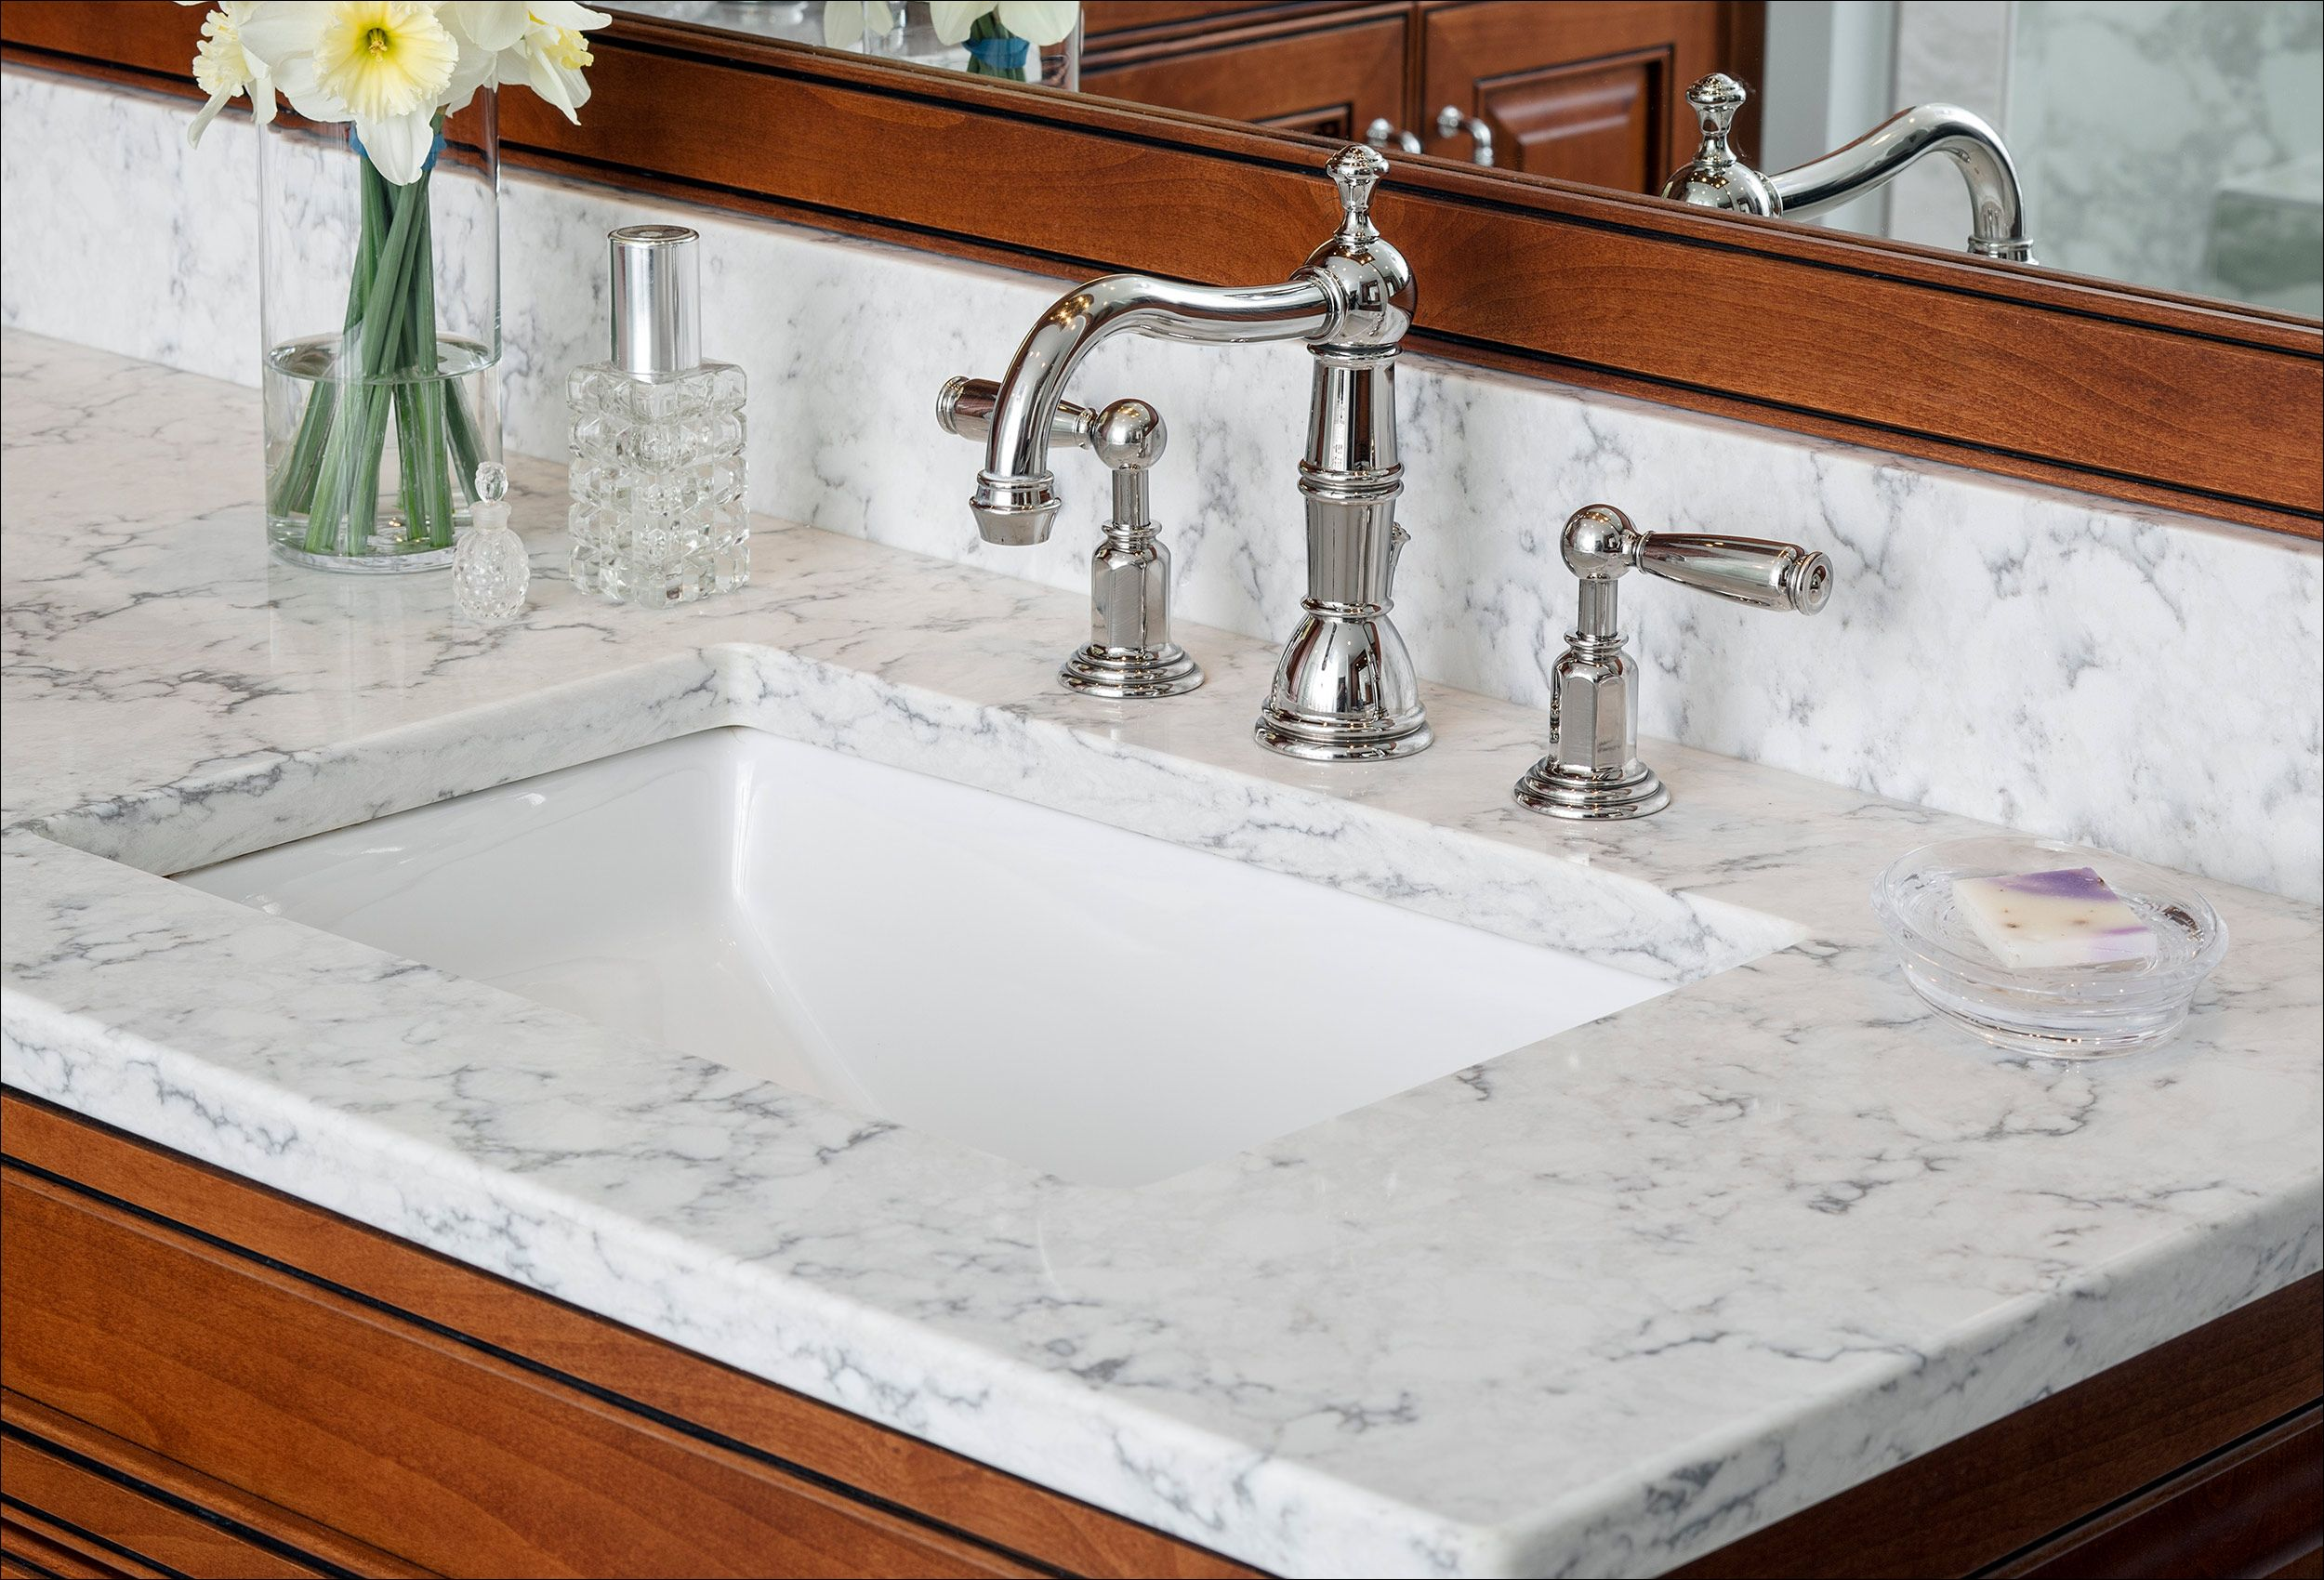 Bathroom_Countertop_Faucet.jpg